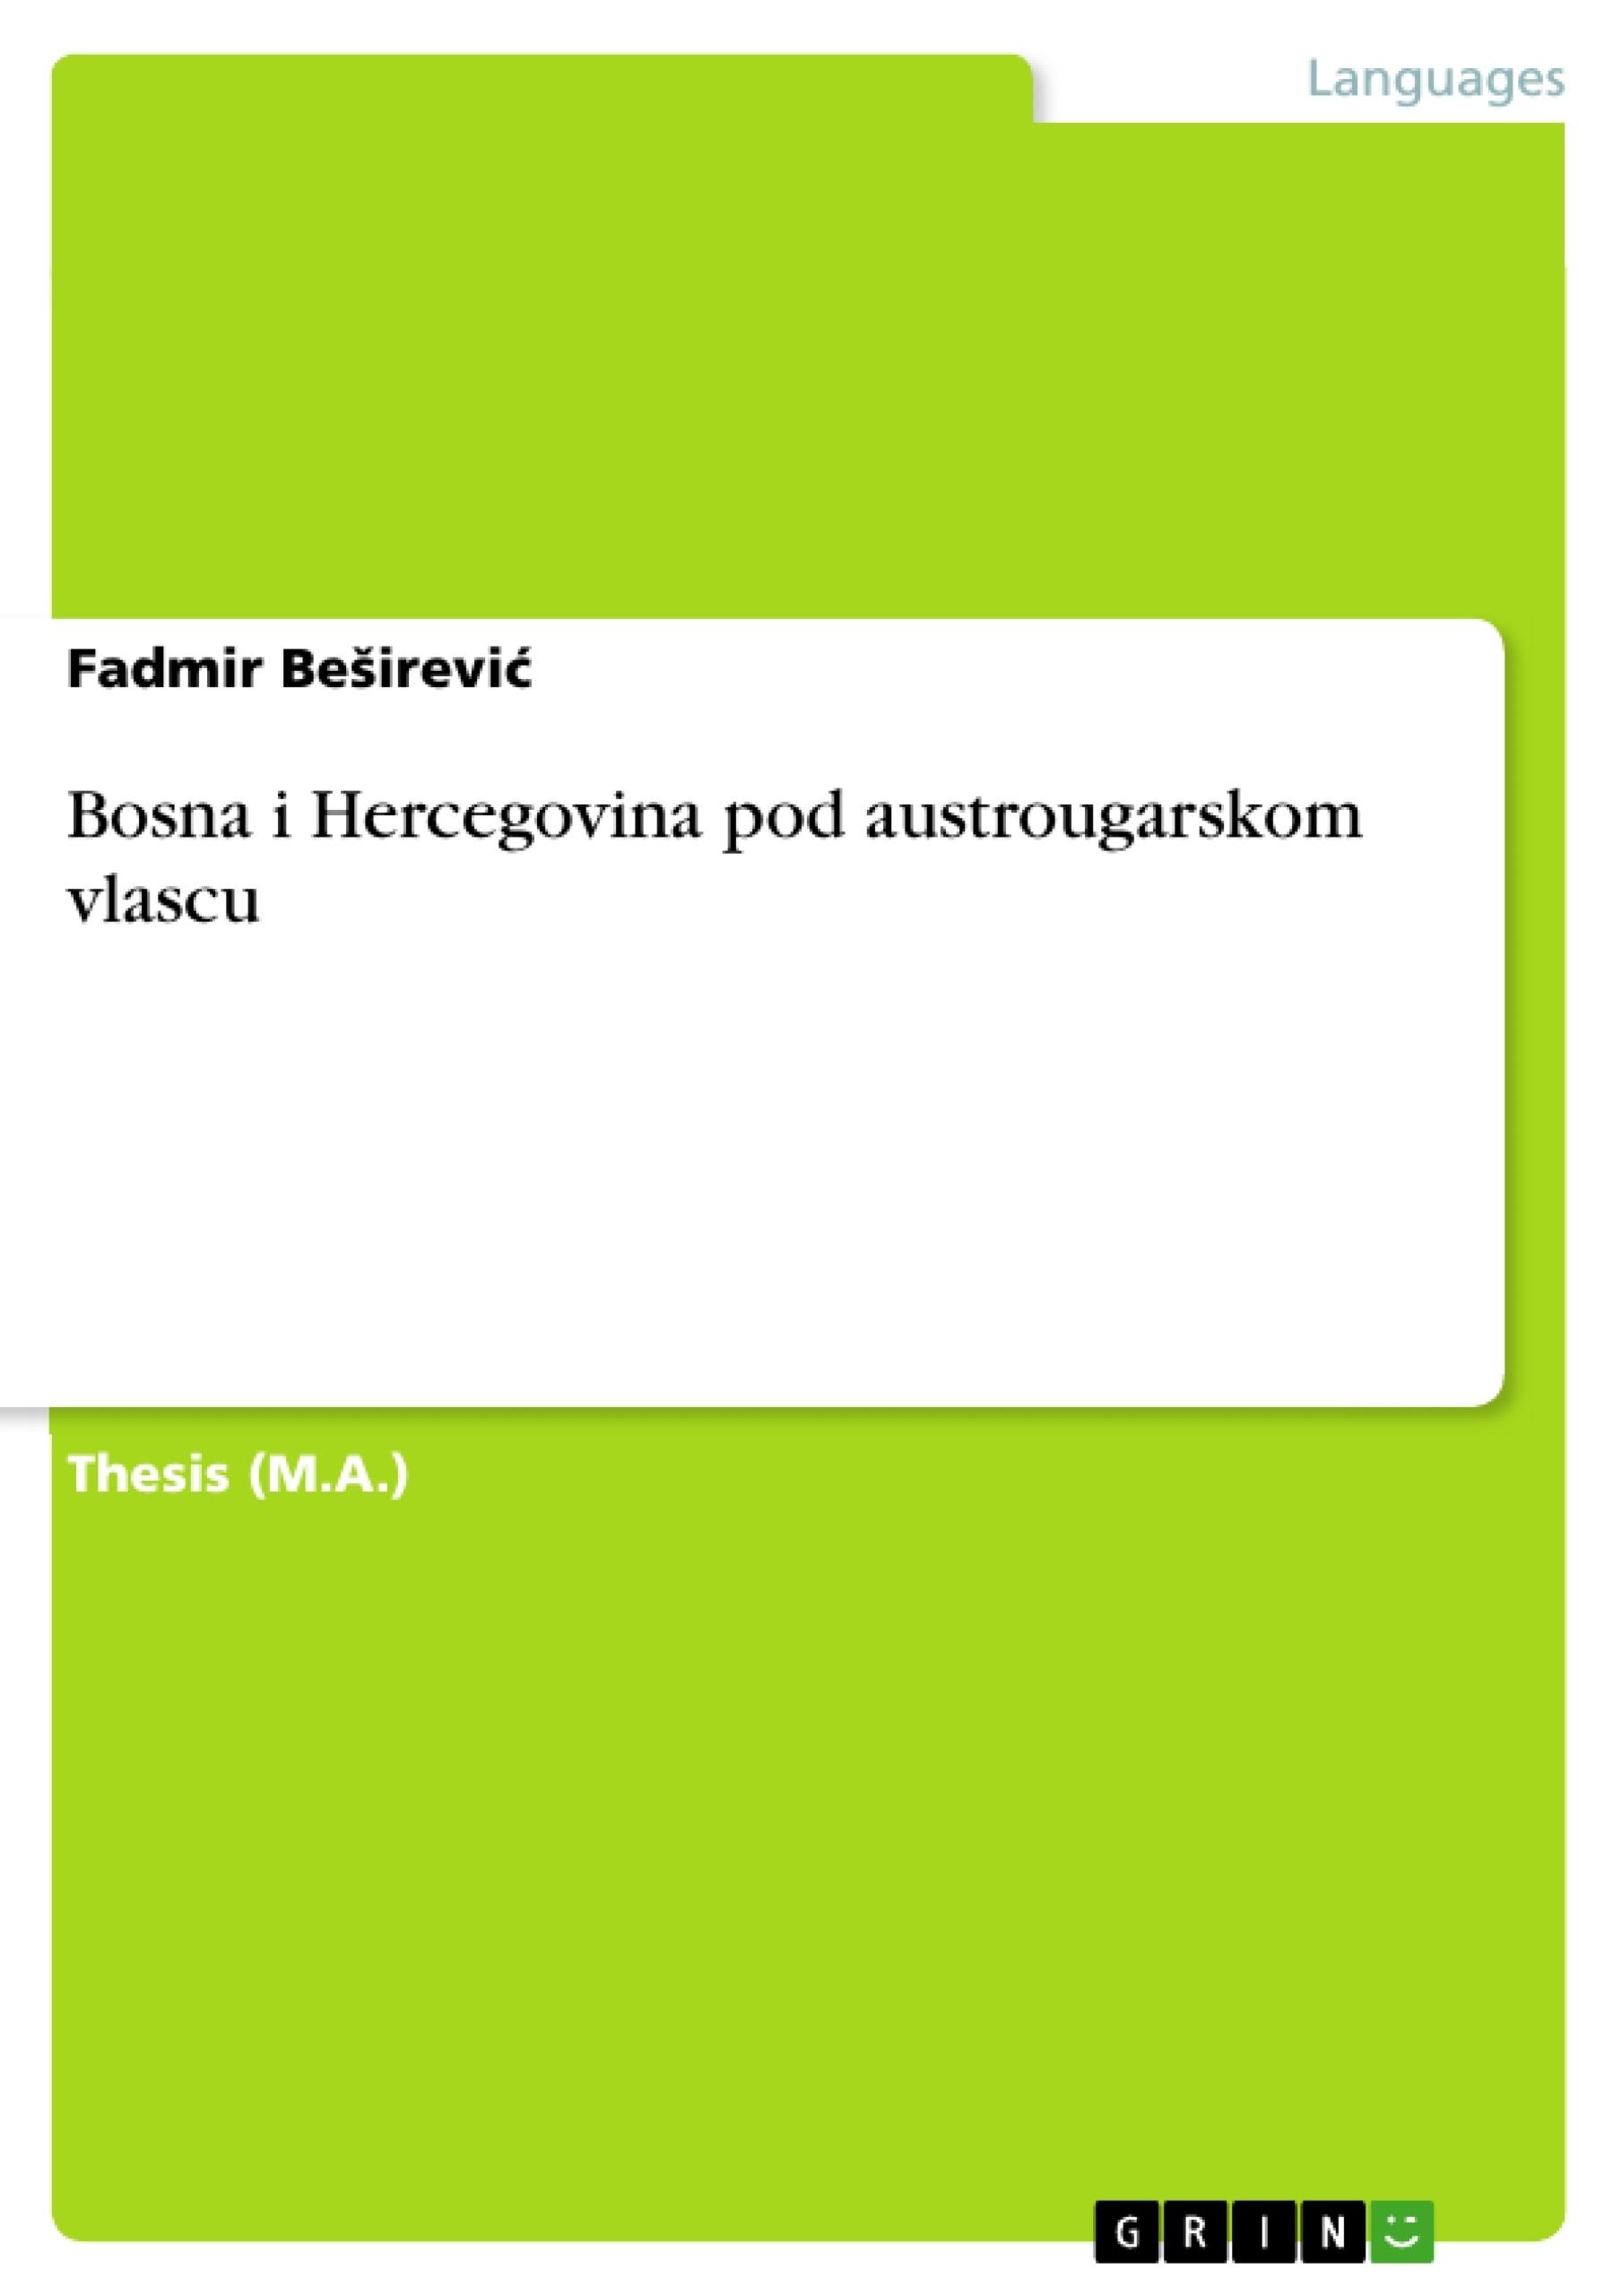 Title: Bosna i Hercegovina pod austrougarskom vlascu